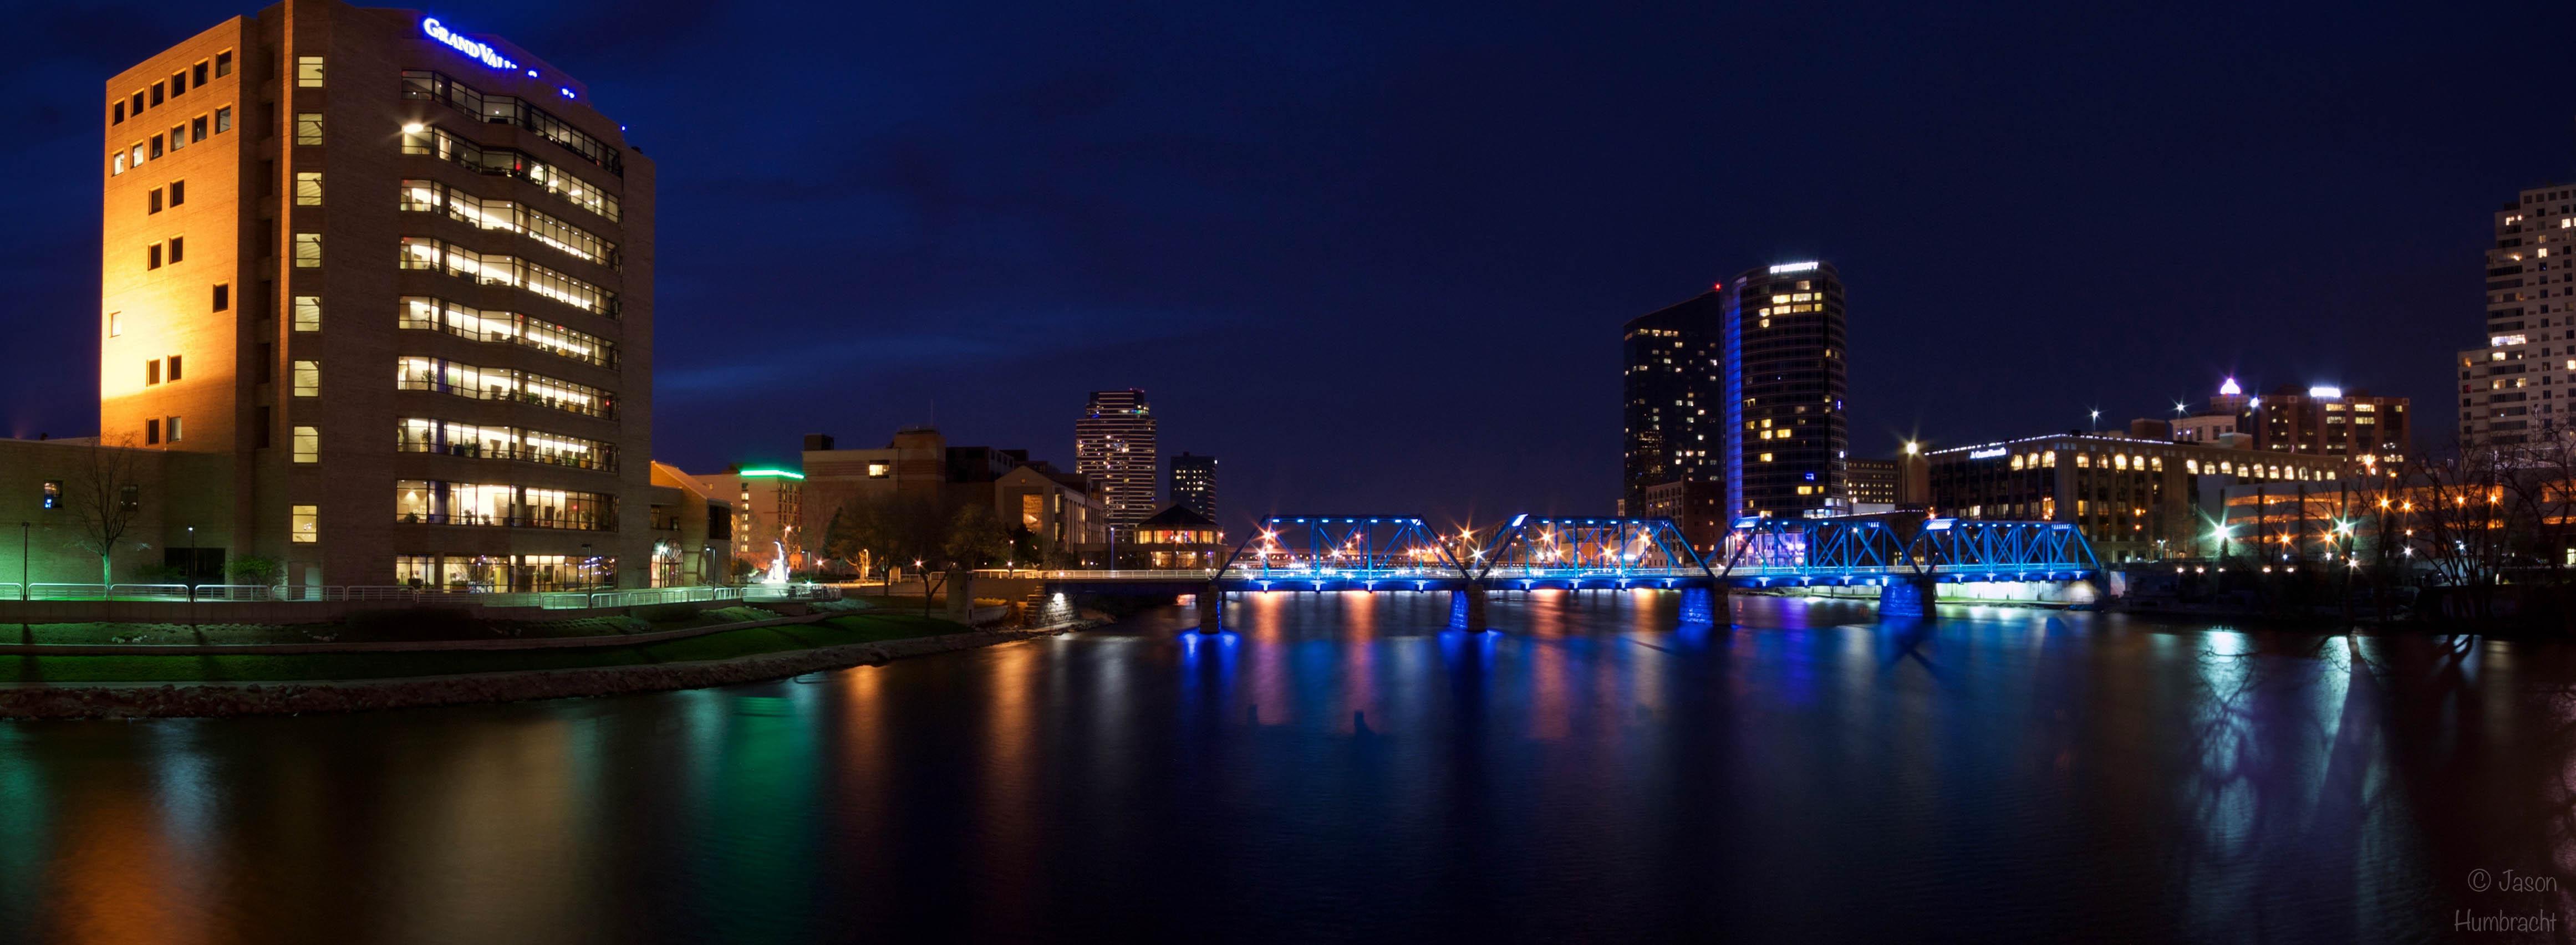 City Of Grand Rapids Architecture Of Michigan